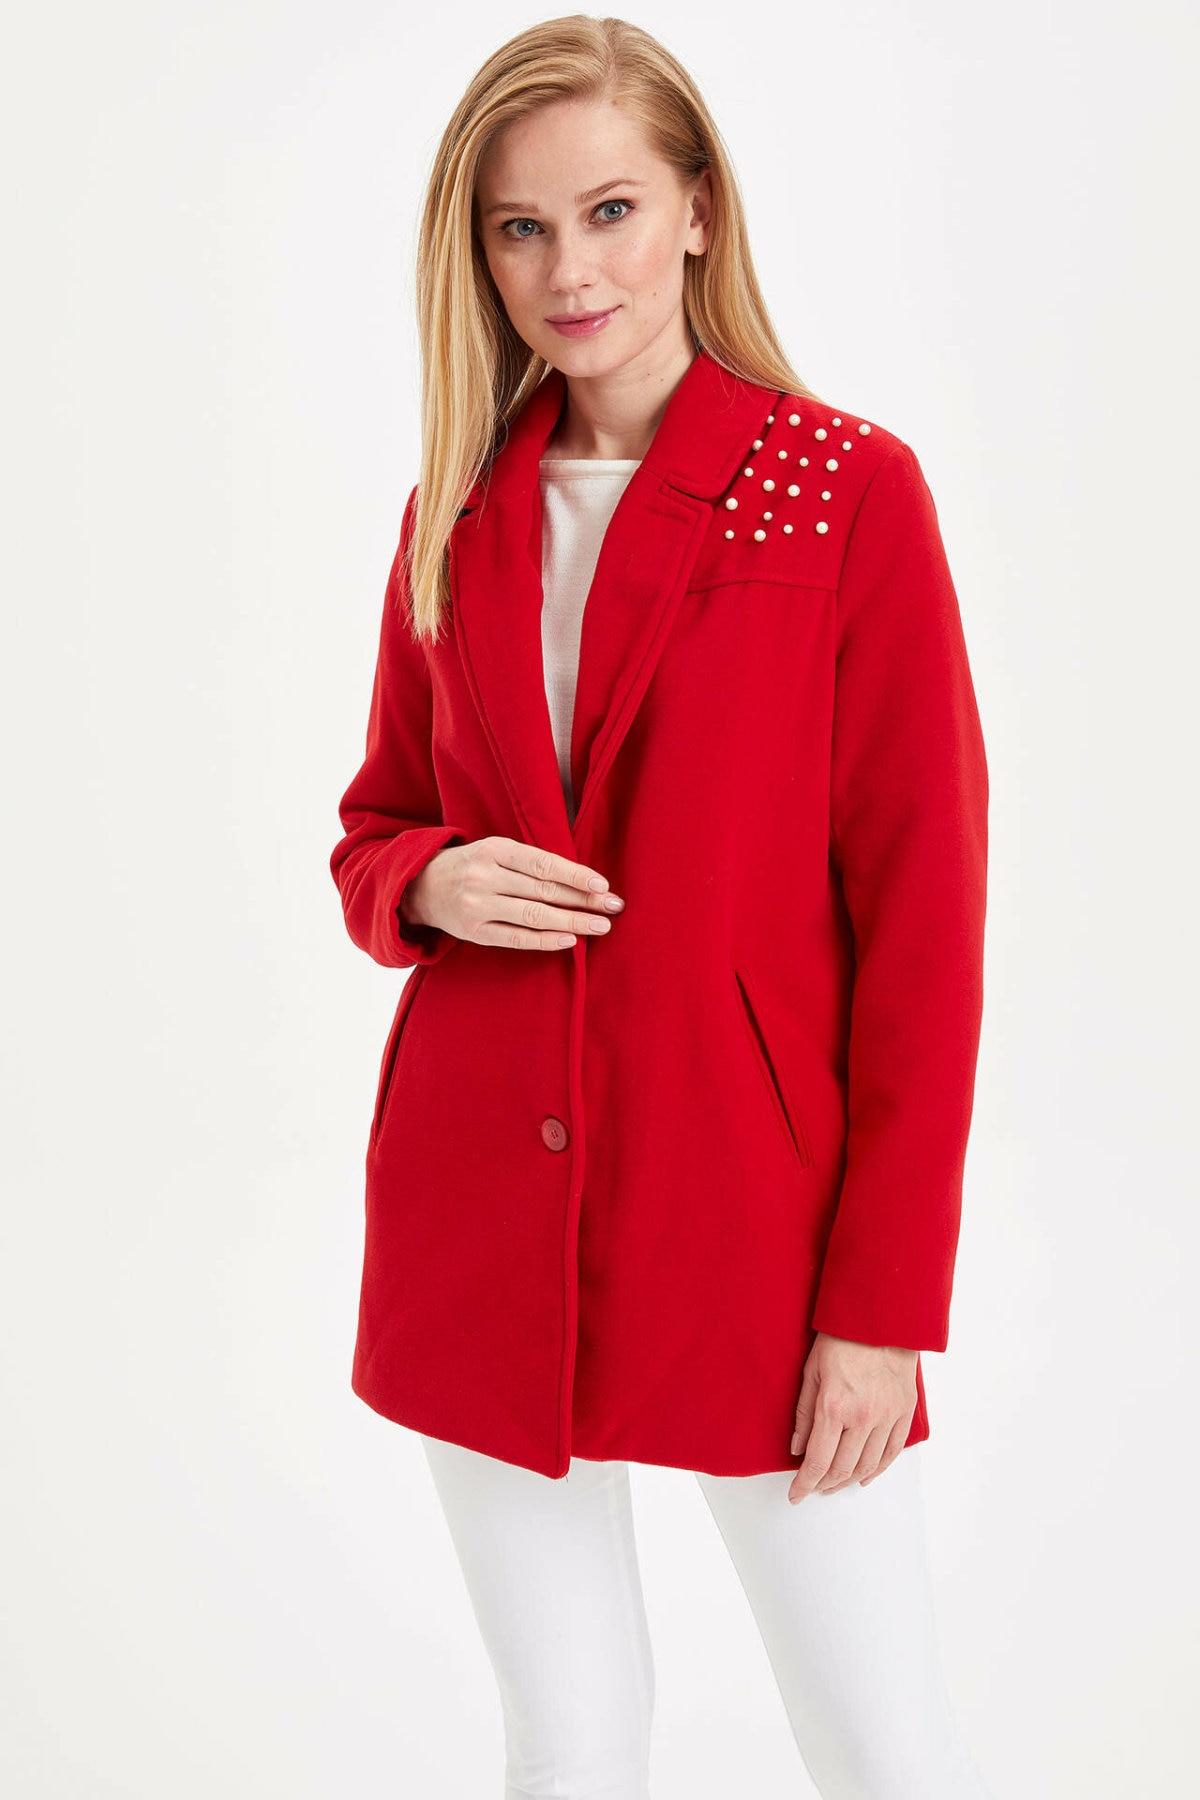 DeFacto Women Autumn Winter Coat Black Red Thick Cotton Coat Cachet Female Warm Overcoat Pearl Decors-I2947AZ17WN-I2947AZ17WN